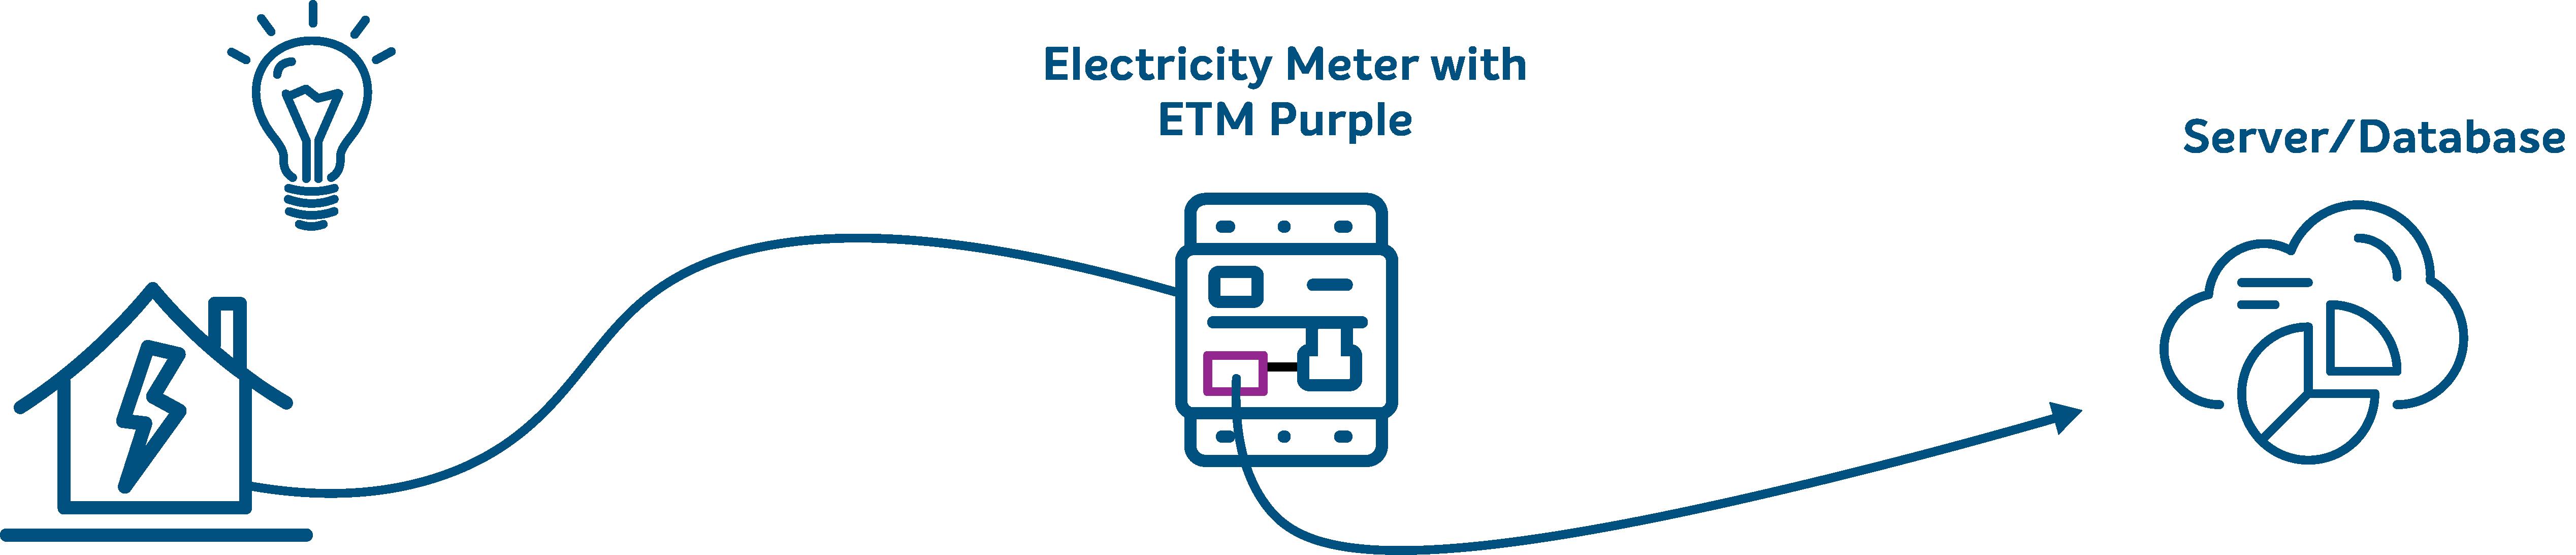 Illustration of how smart metering works